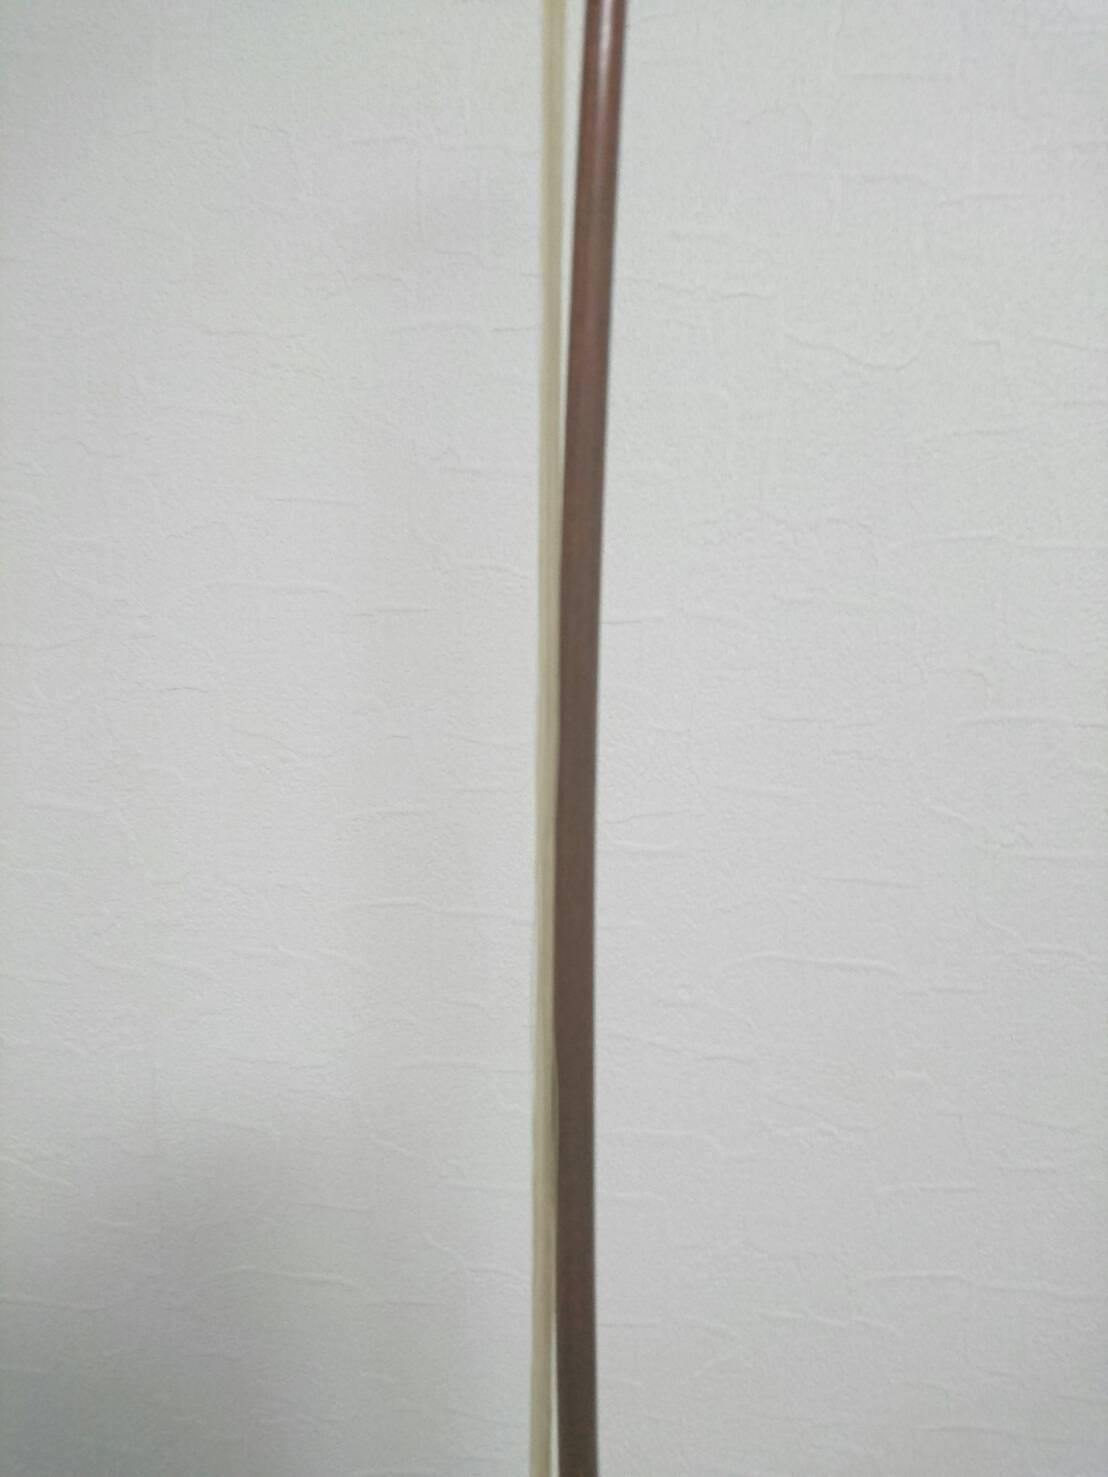 弓 縦 バイオリン教室 石神井公園 大泉学園 練馬